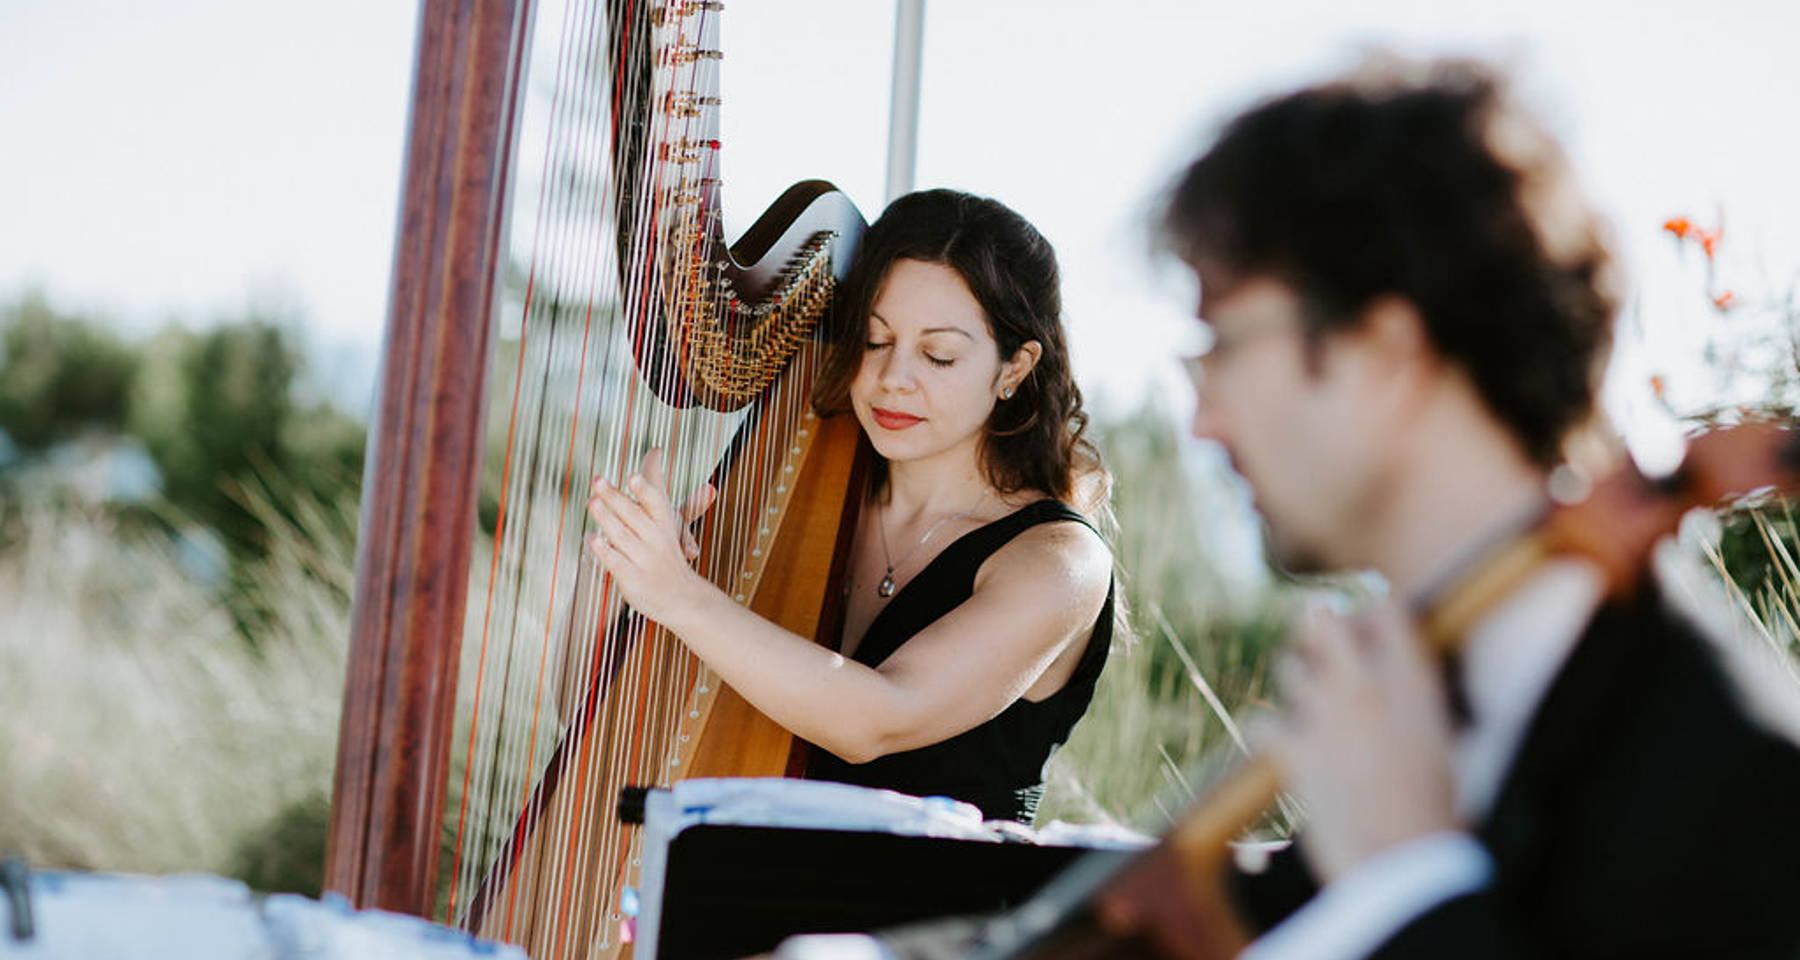 Strange Interlude: Autumn Musings on Harp and Cello